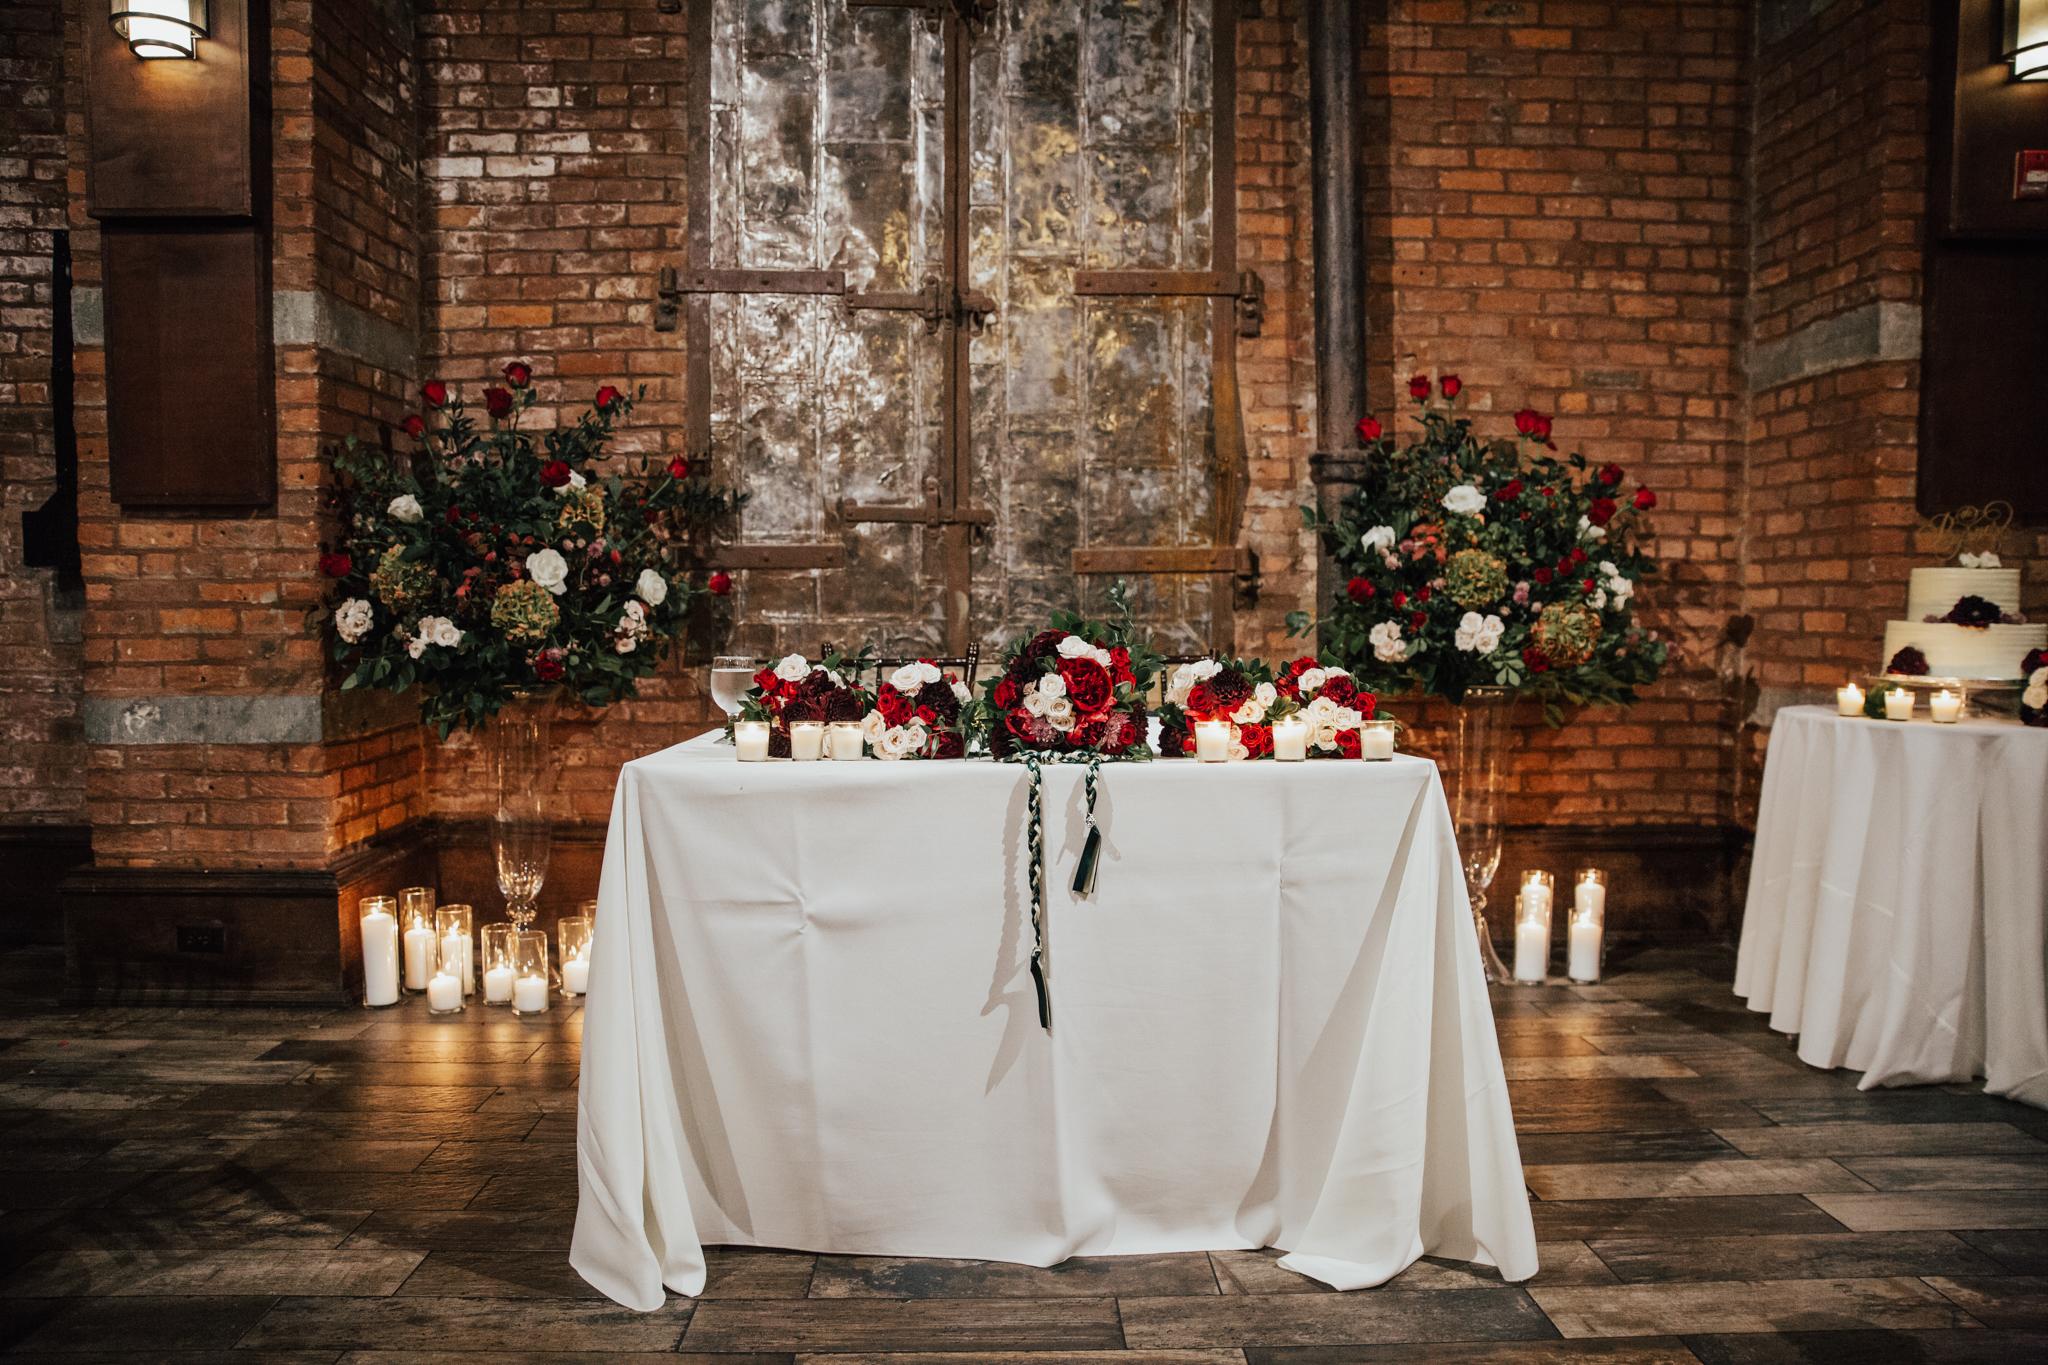 26-bridge-wedding-brooklyn-092.JPG